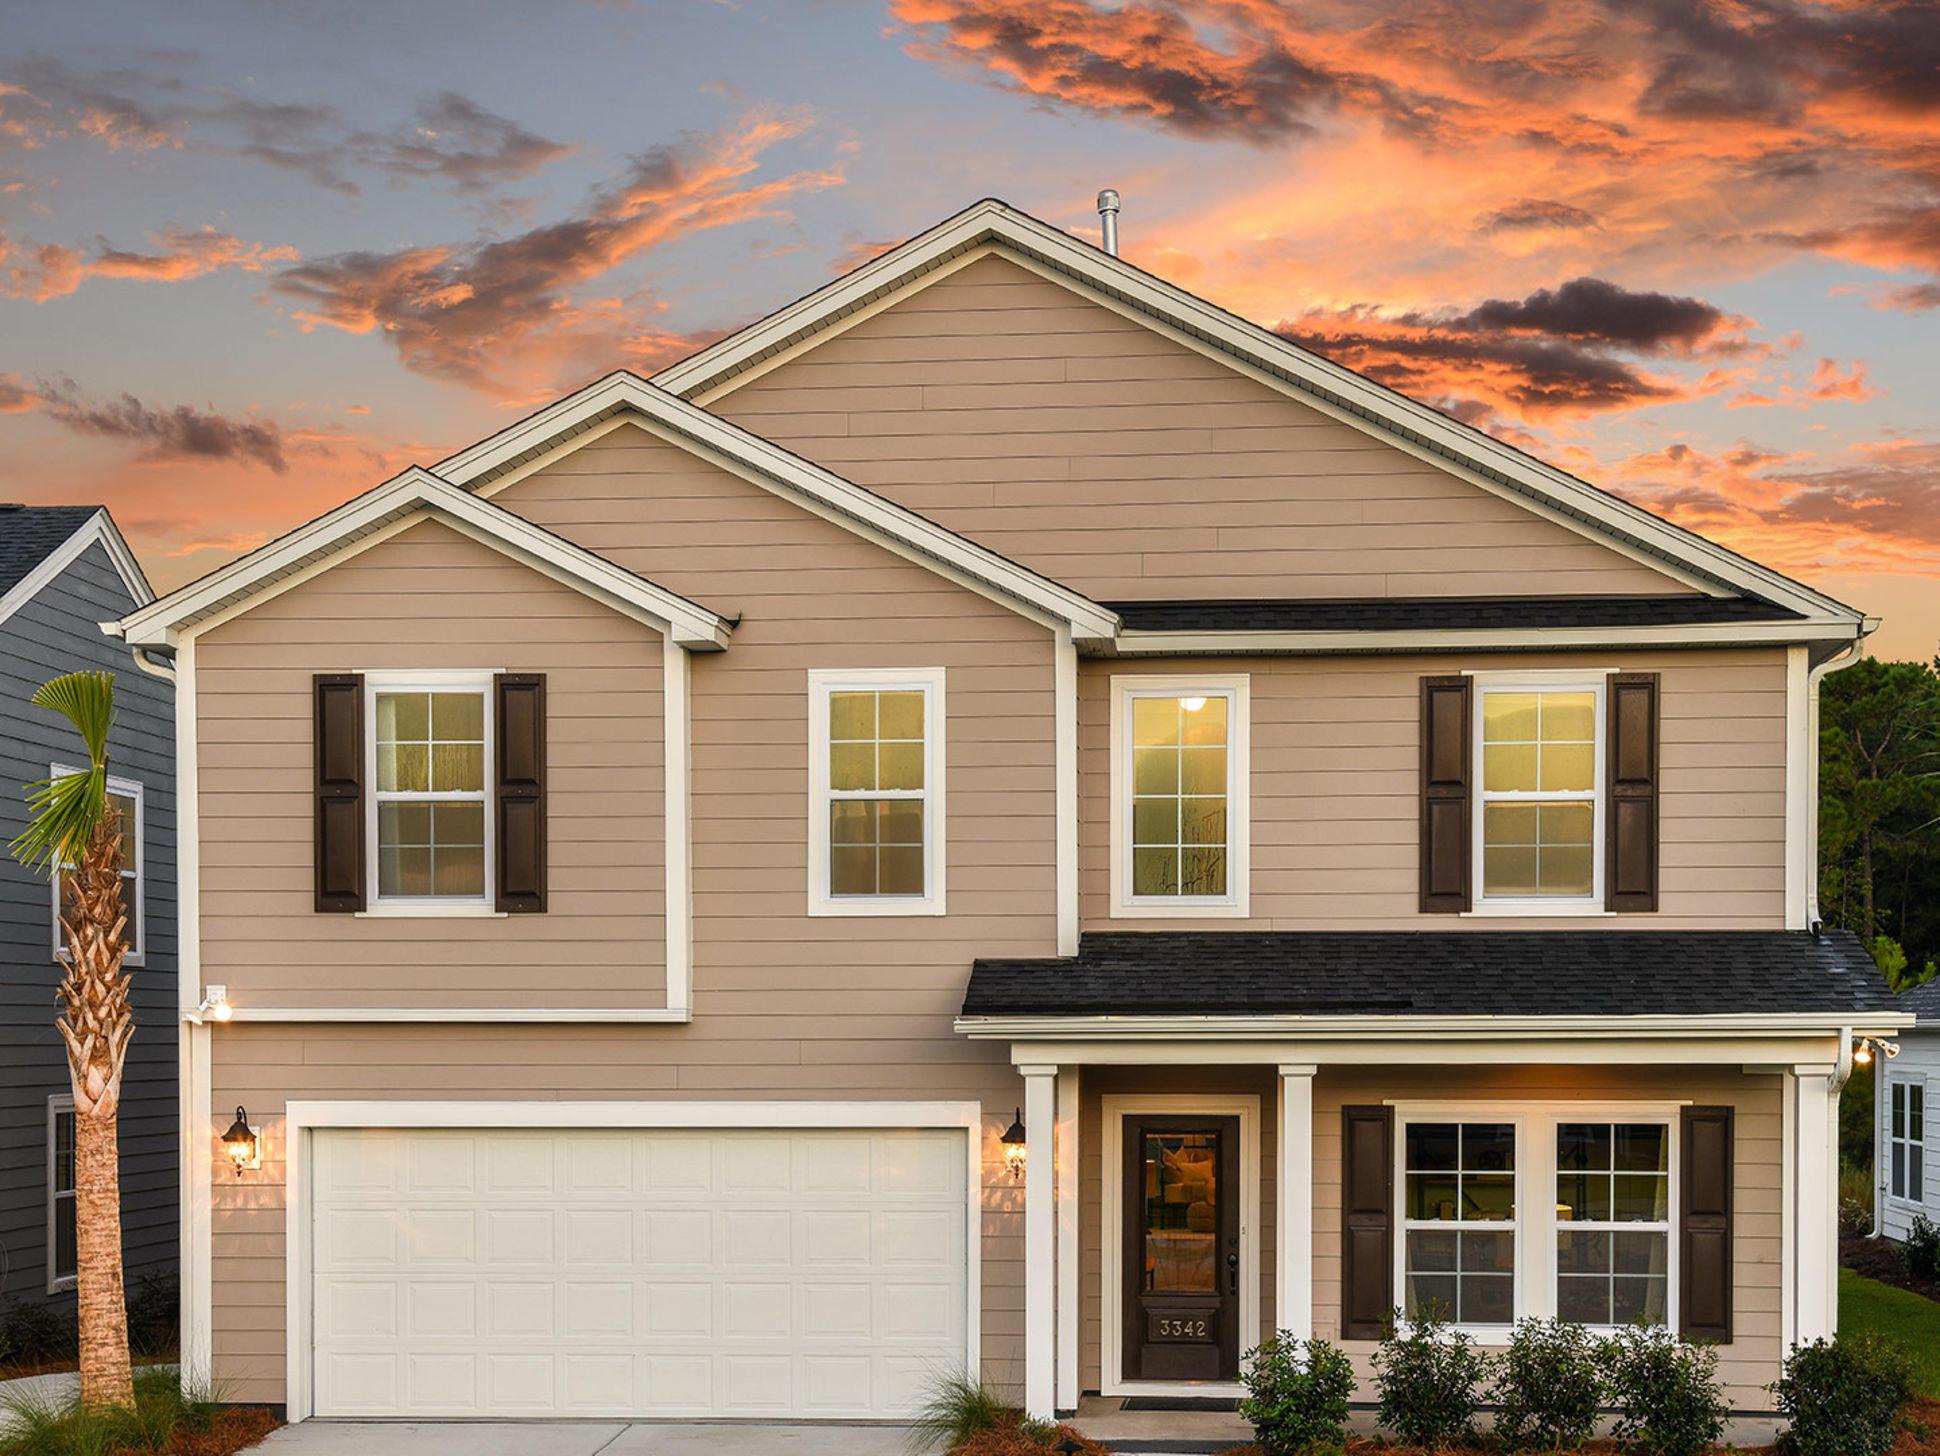 St. Johns Lake Homes For Sale - 5081 Catfish Loop, Johns Island, SC - 0